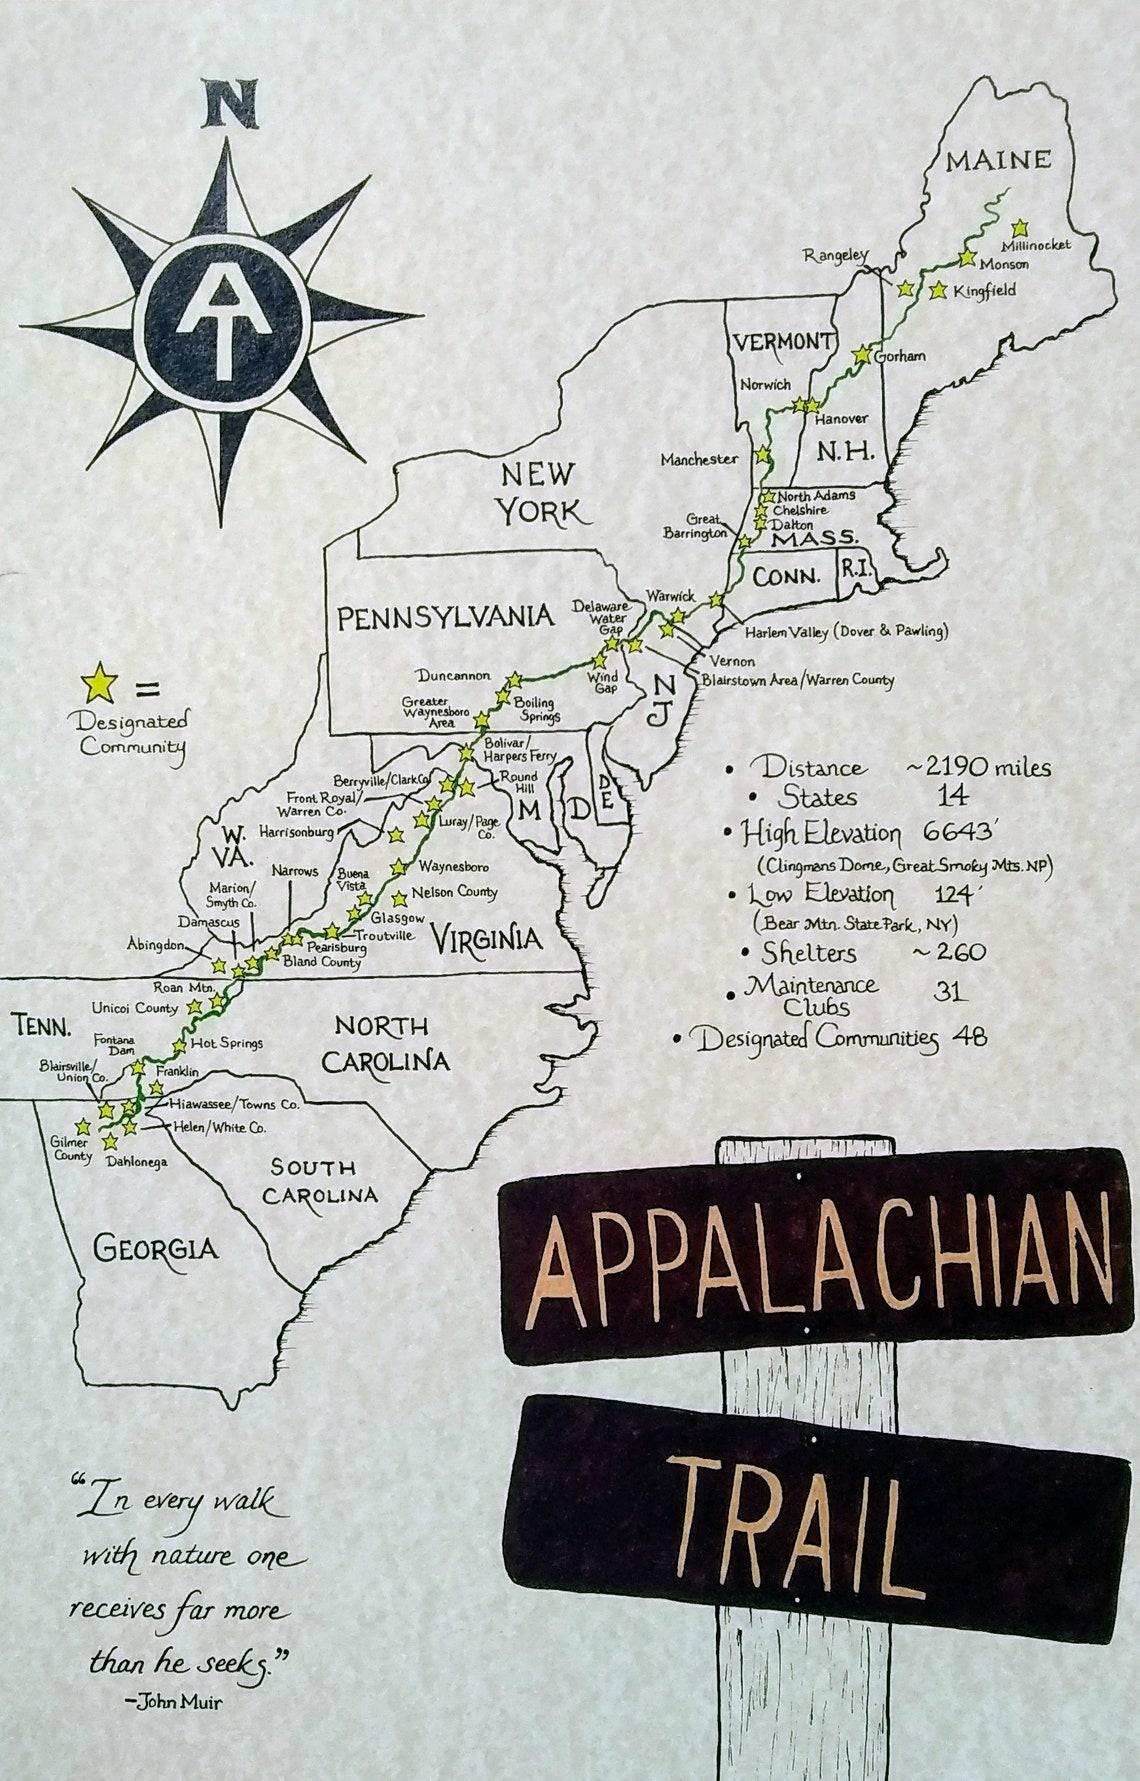 Appalachian Trail hand drawn map image 0